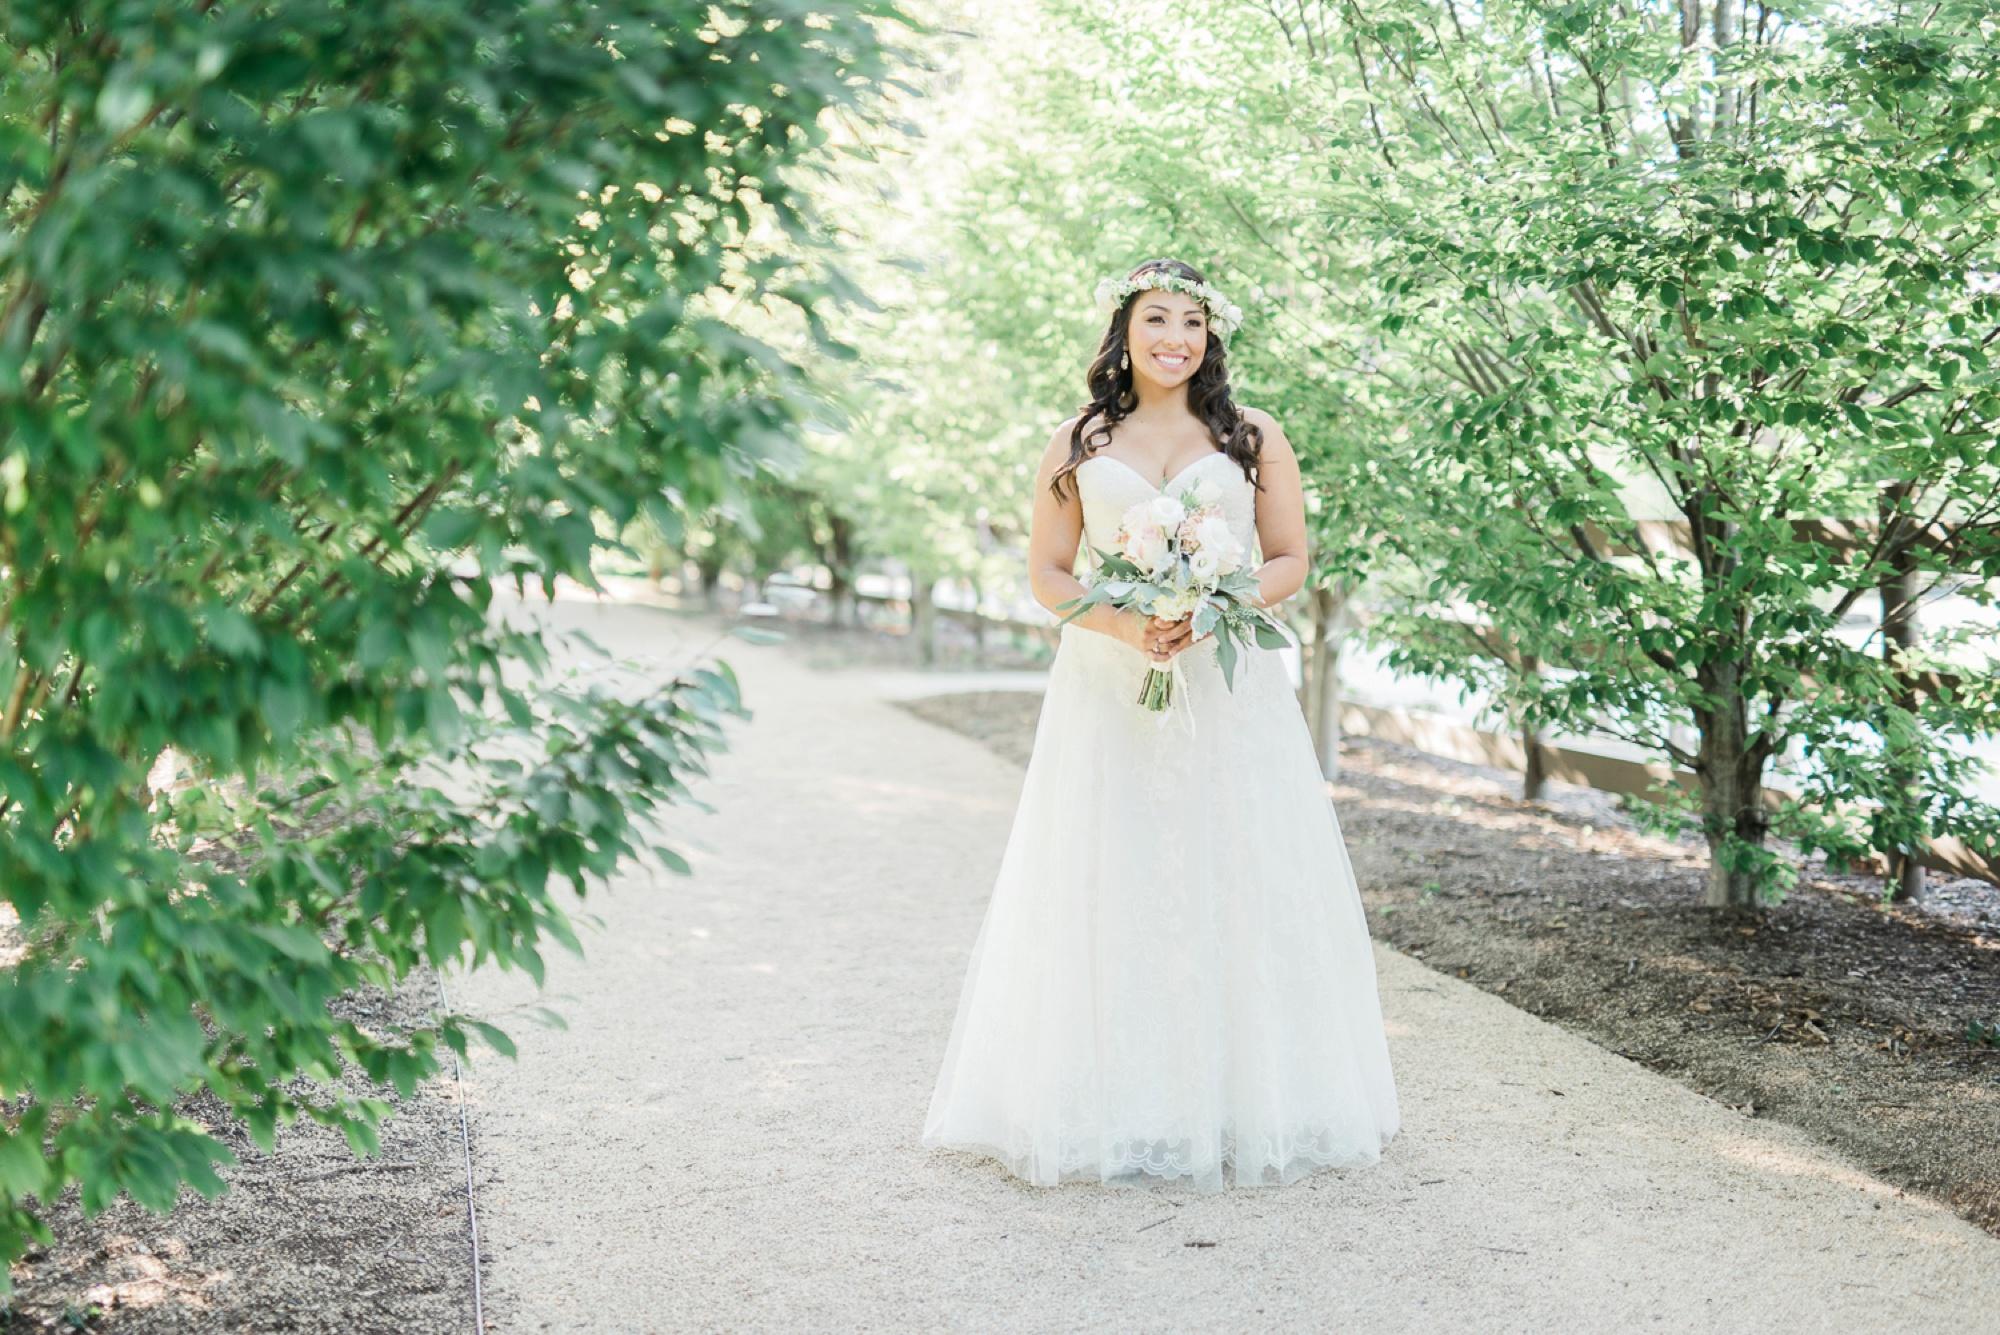 wells-barn-wedding-at-franklin-park-conservatory-45.jpg